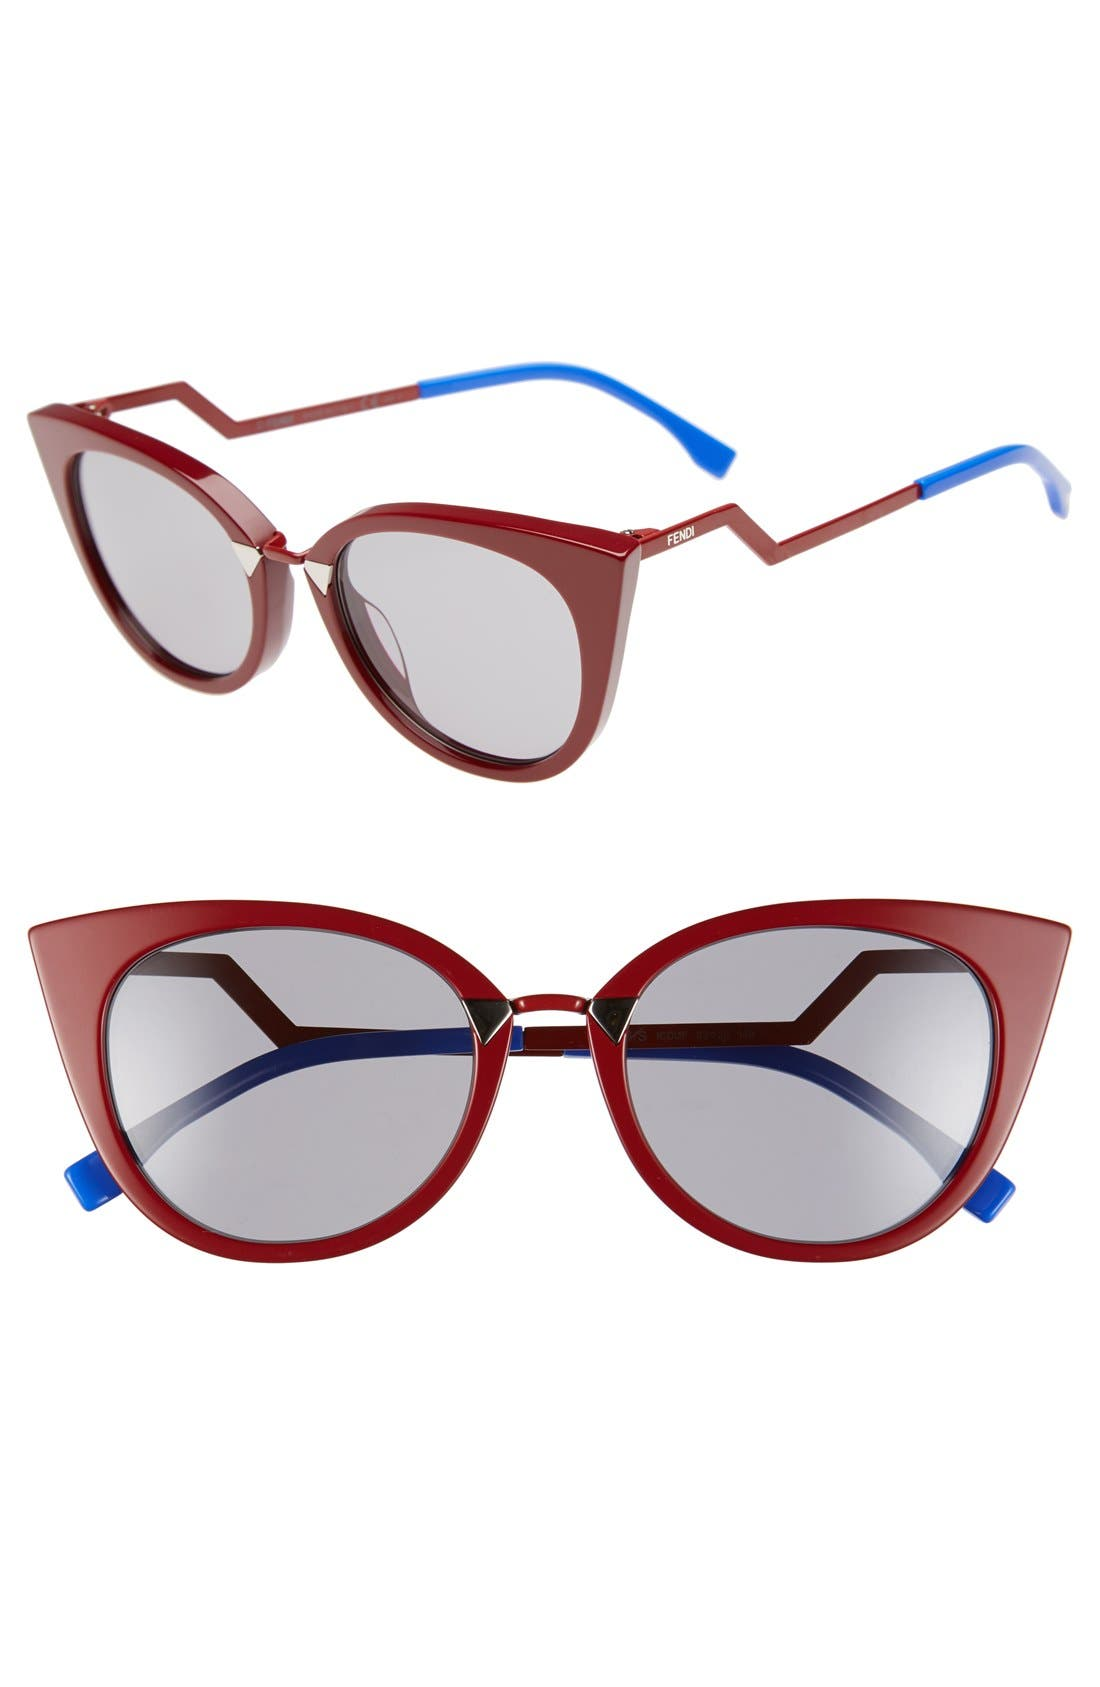 52mm Cat Eye Sunglasses,                             Main thumbnail 1, color,